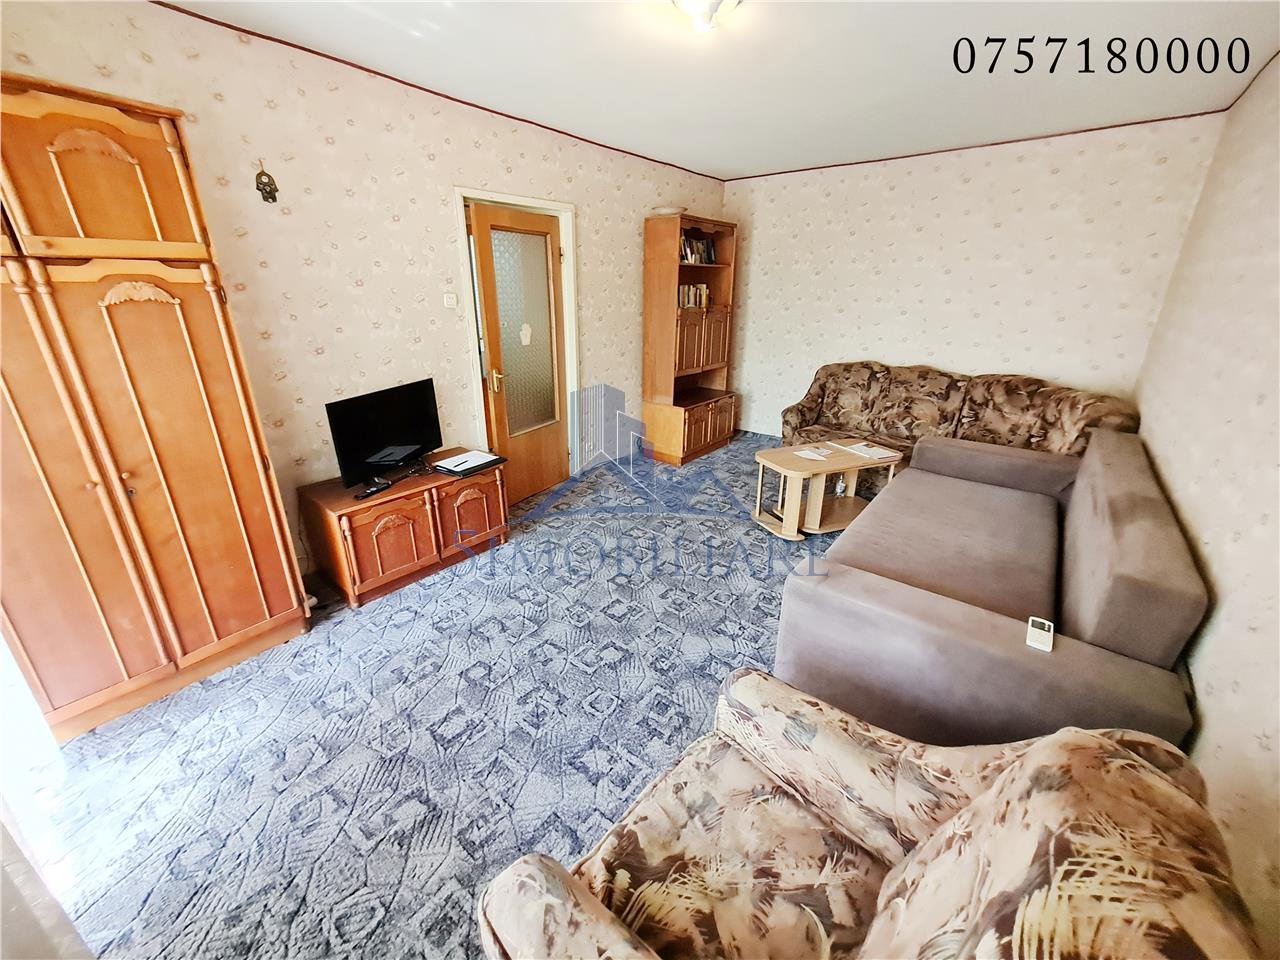 Apartament 2 camere decomandat Militari - 1 minut Metrou Gorjului.